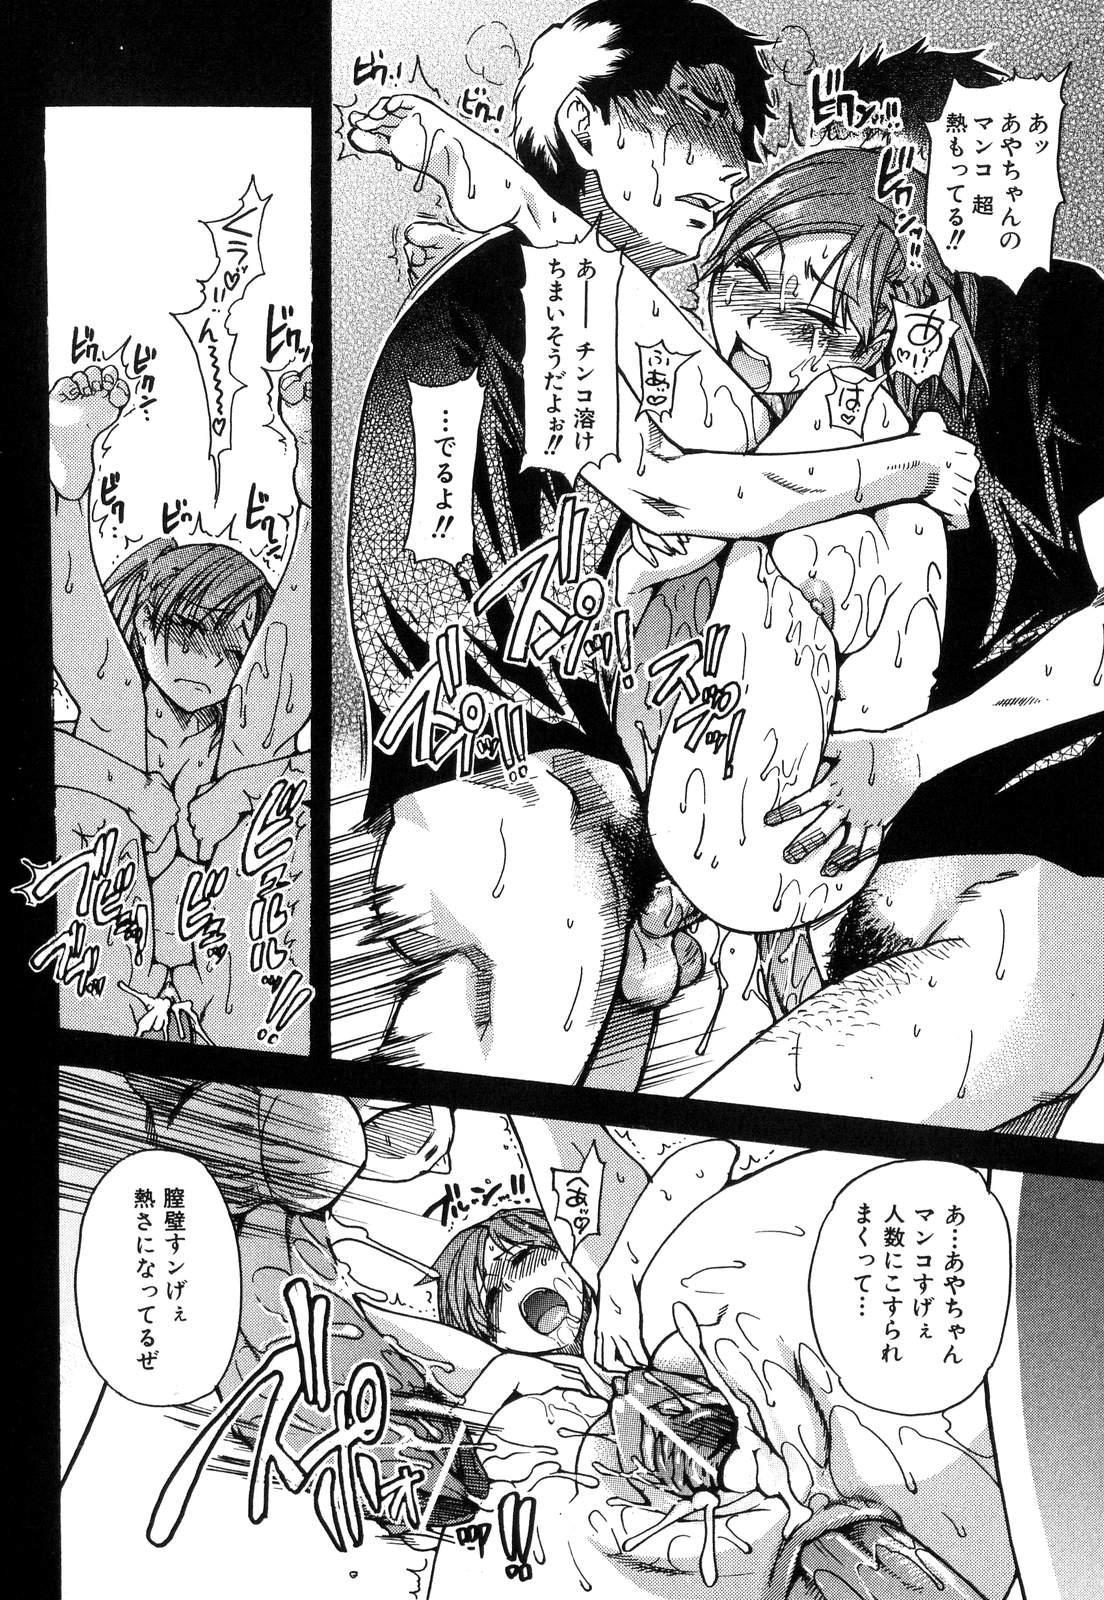 Shining Musume. 6. Rainbow Six 92